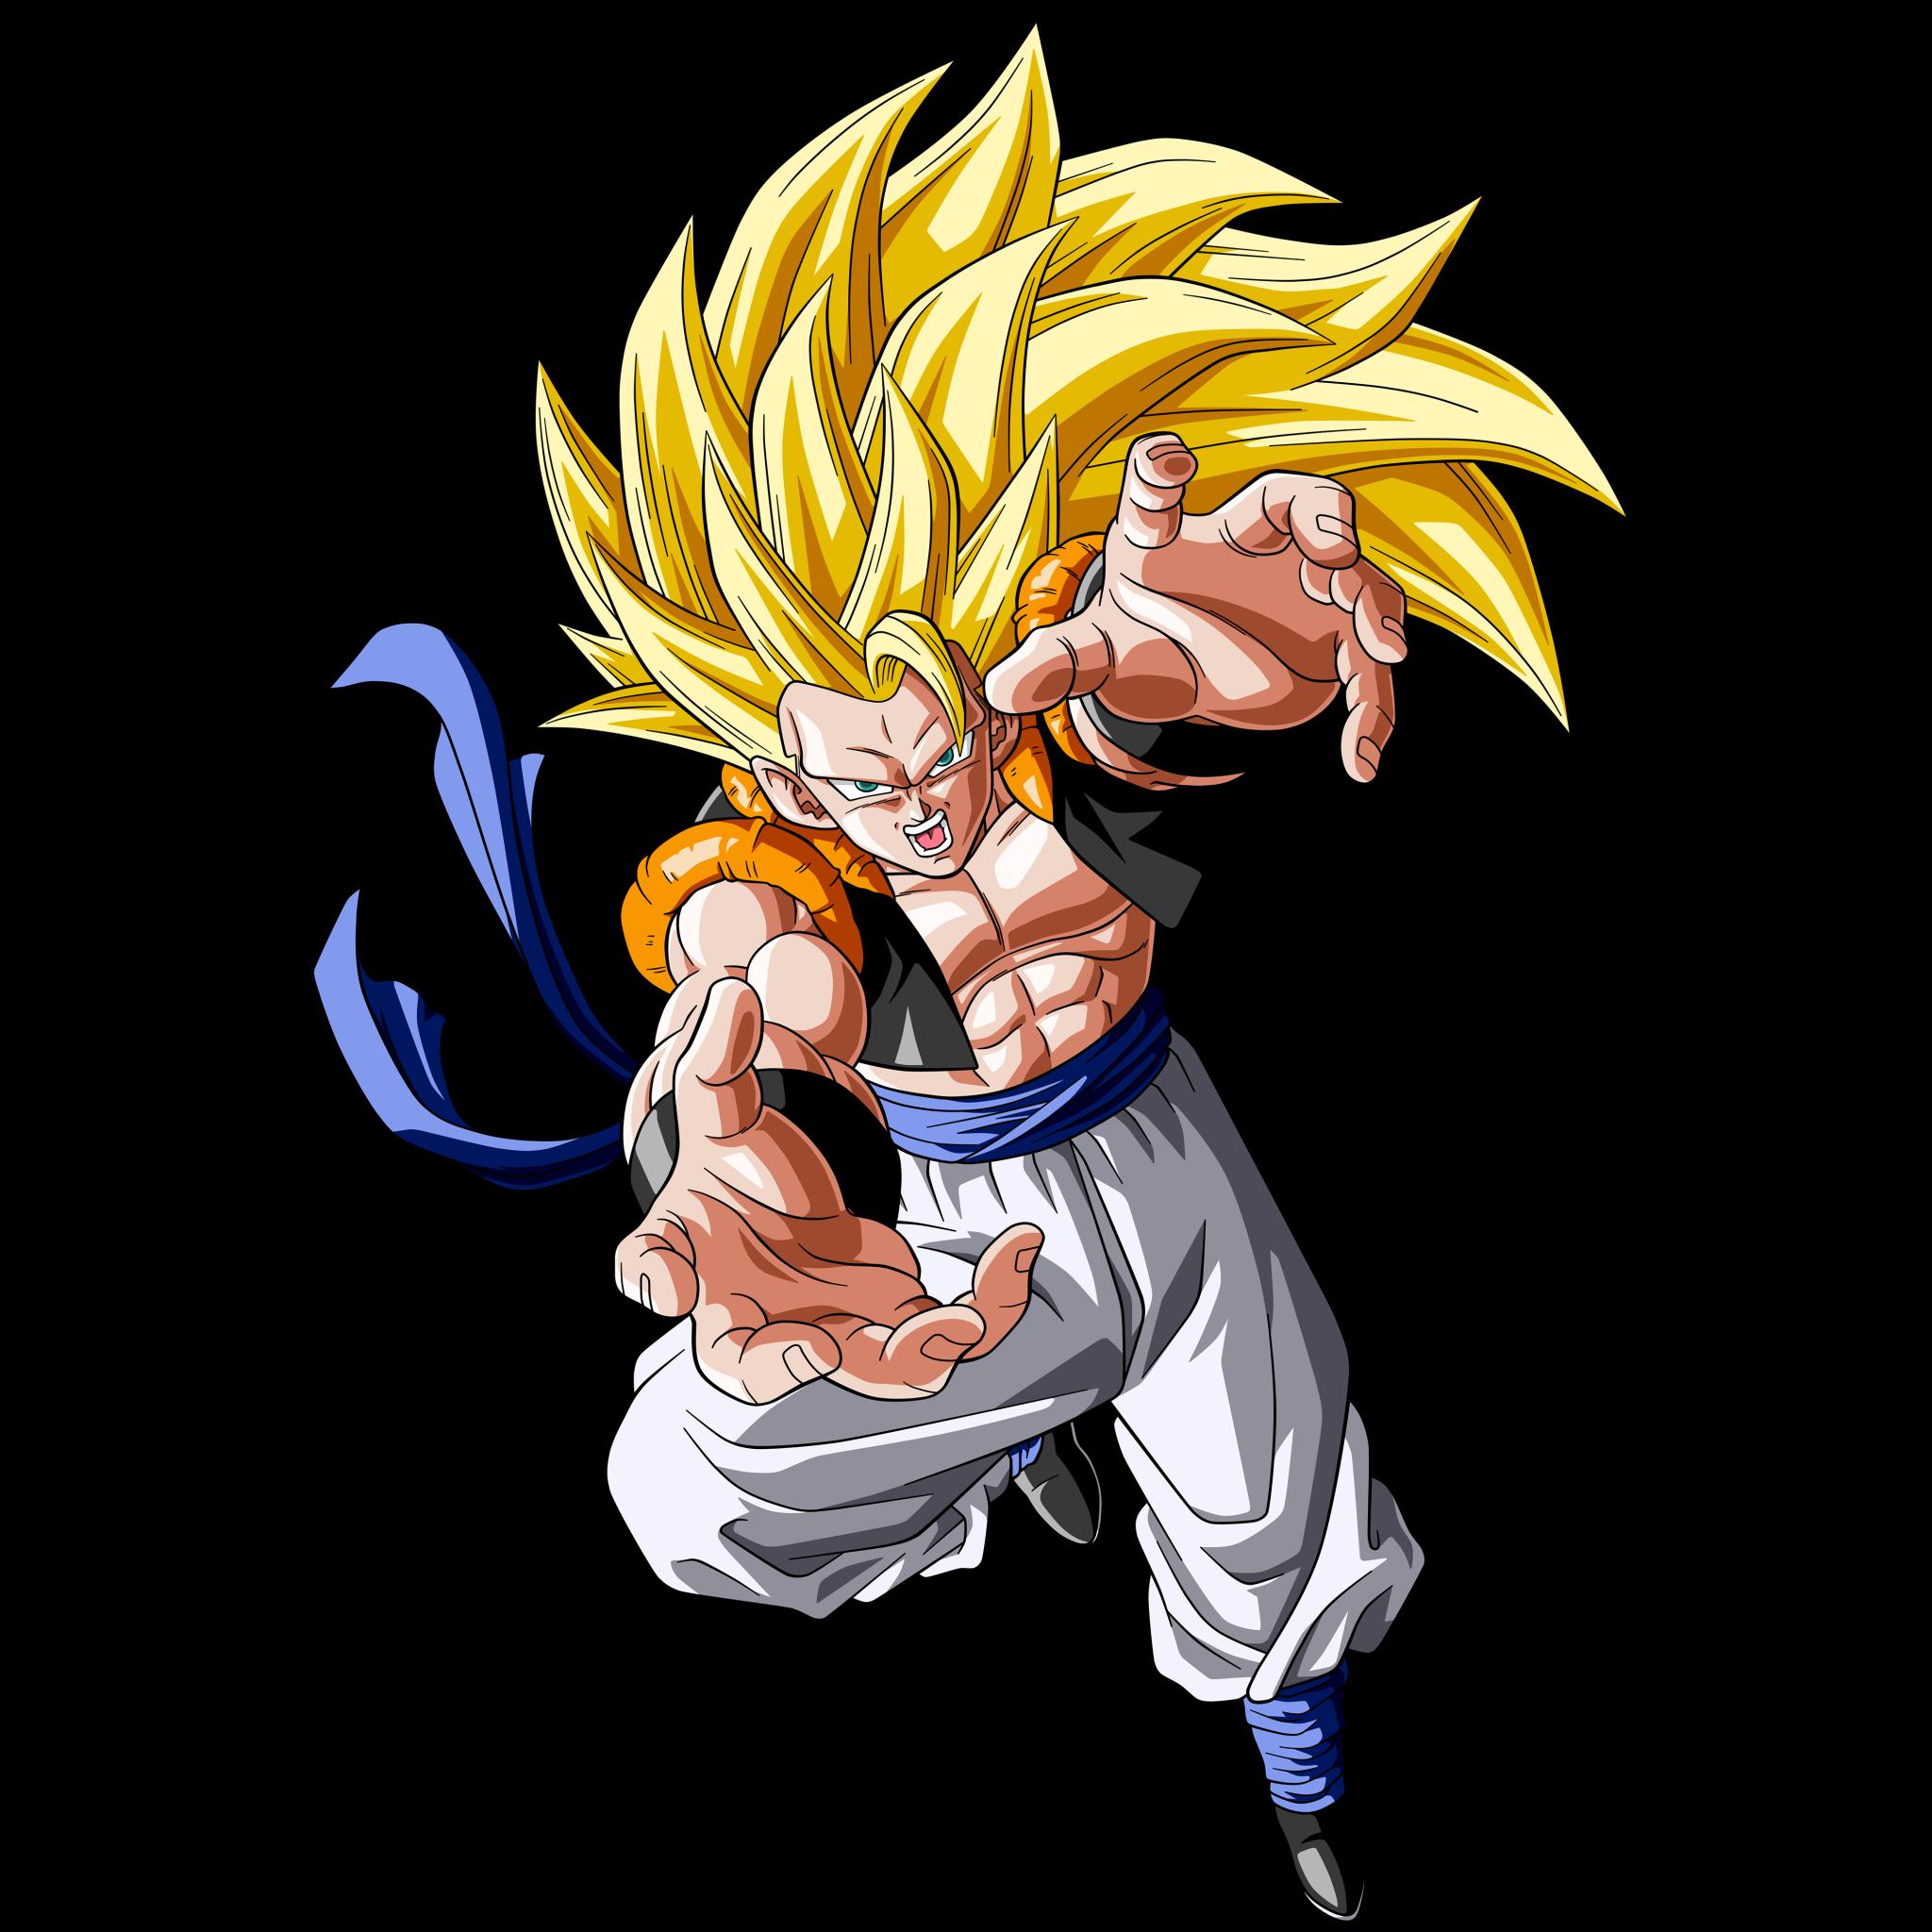 Dragon Ball Z Goku PNG Image Background #267326.